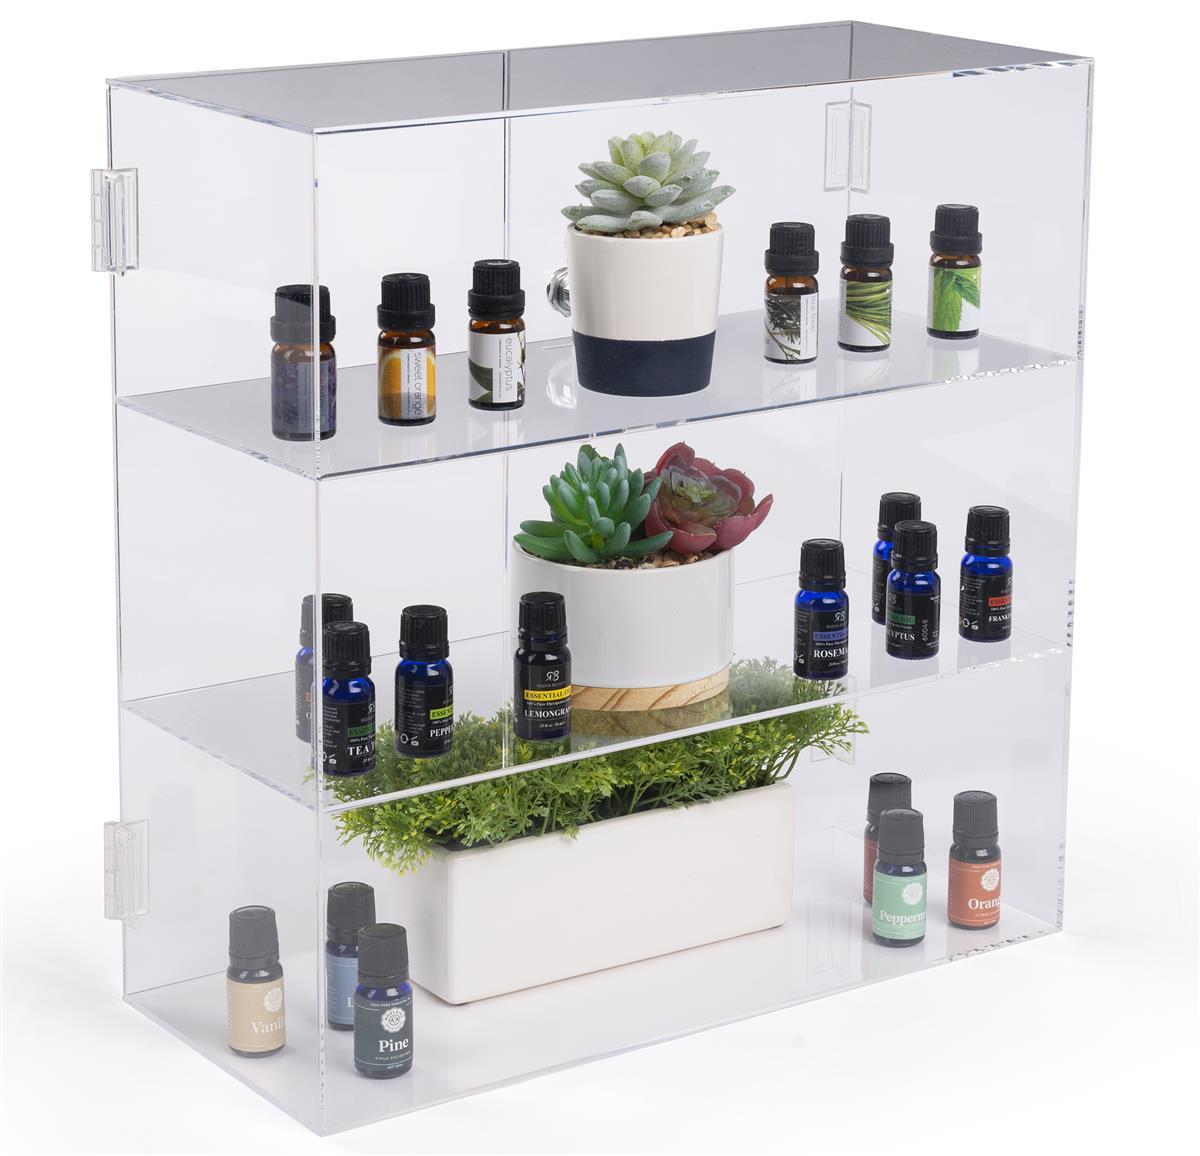 dgs case commercial display acrylic retail bottles countertop liquor mini store w bottle rack